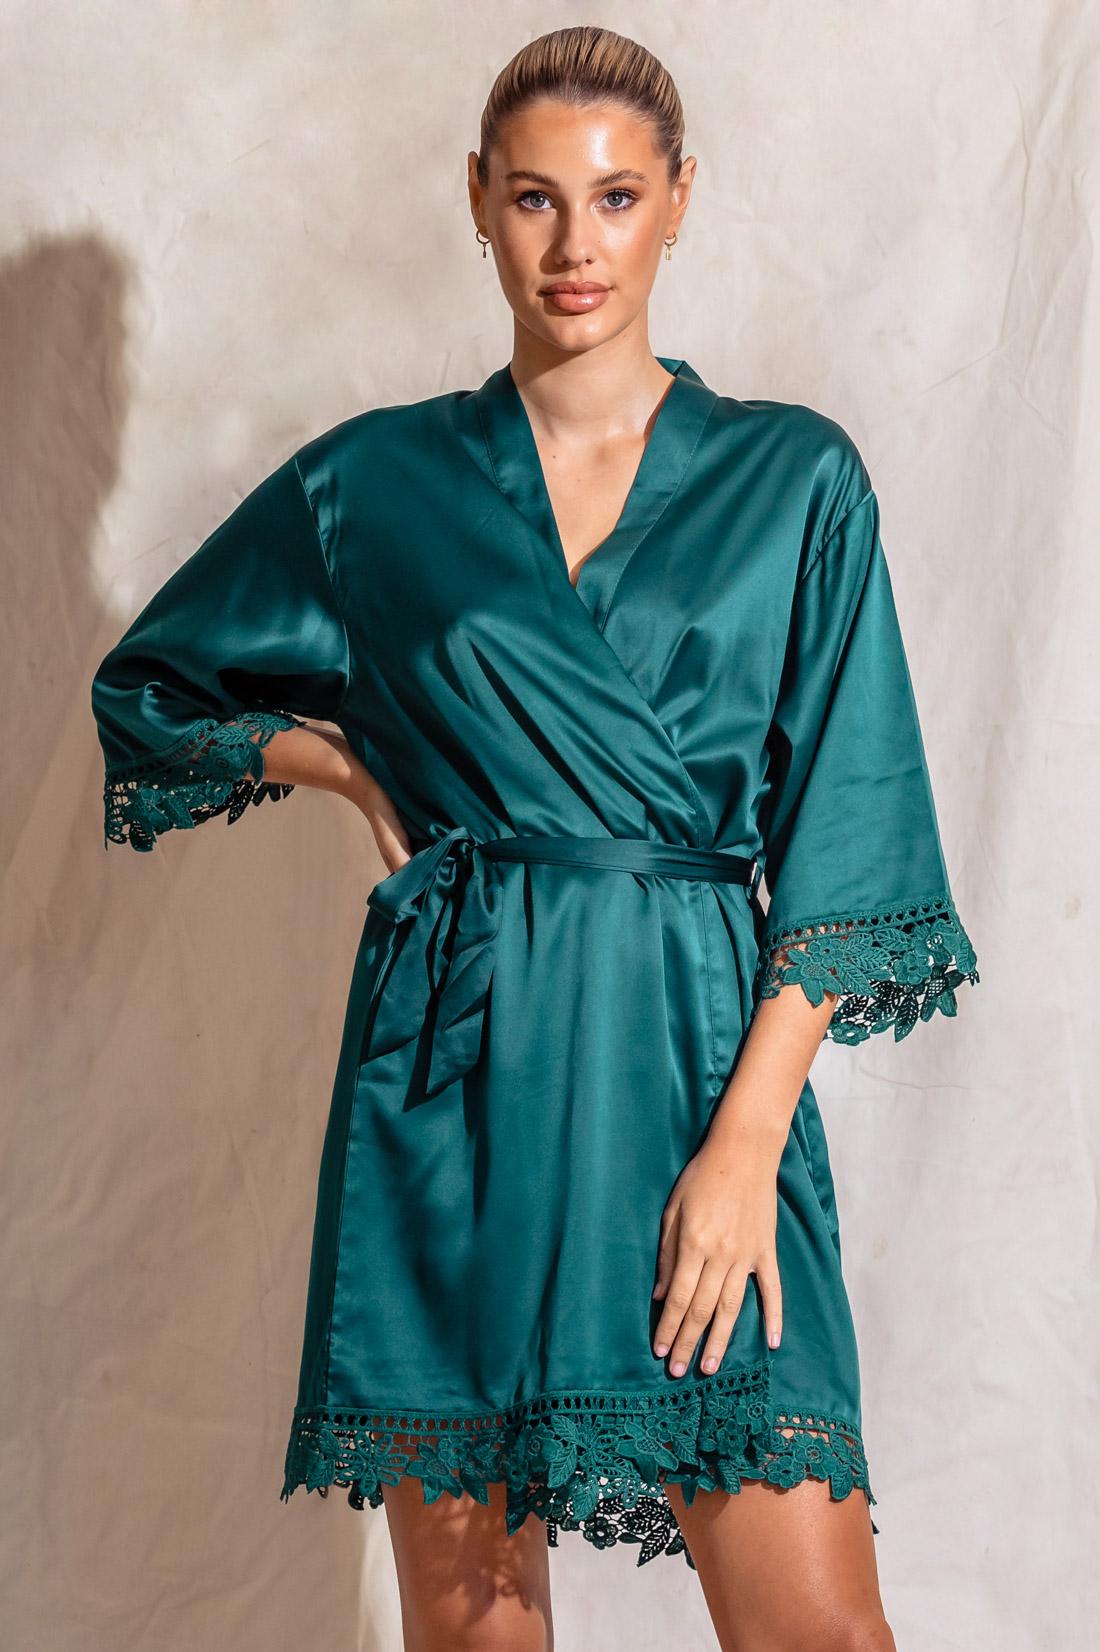 Ella Emerald Green Lace Satin Bridesmaids Robe